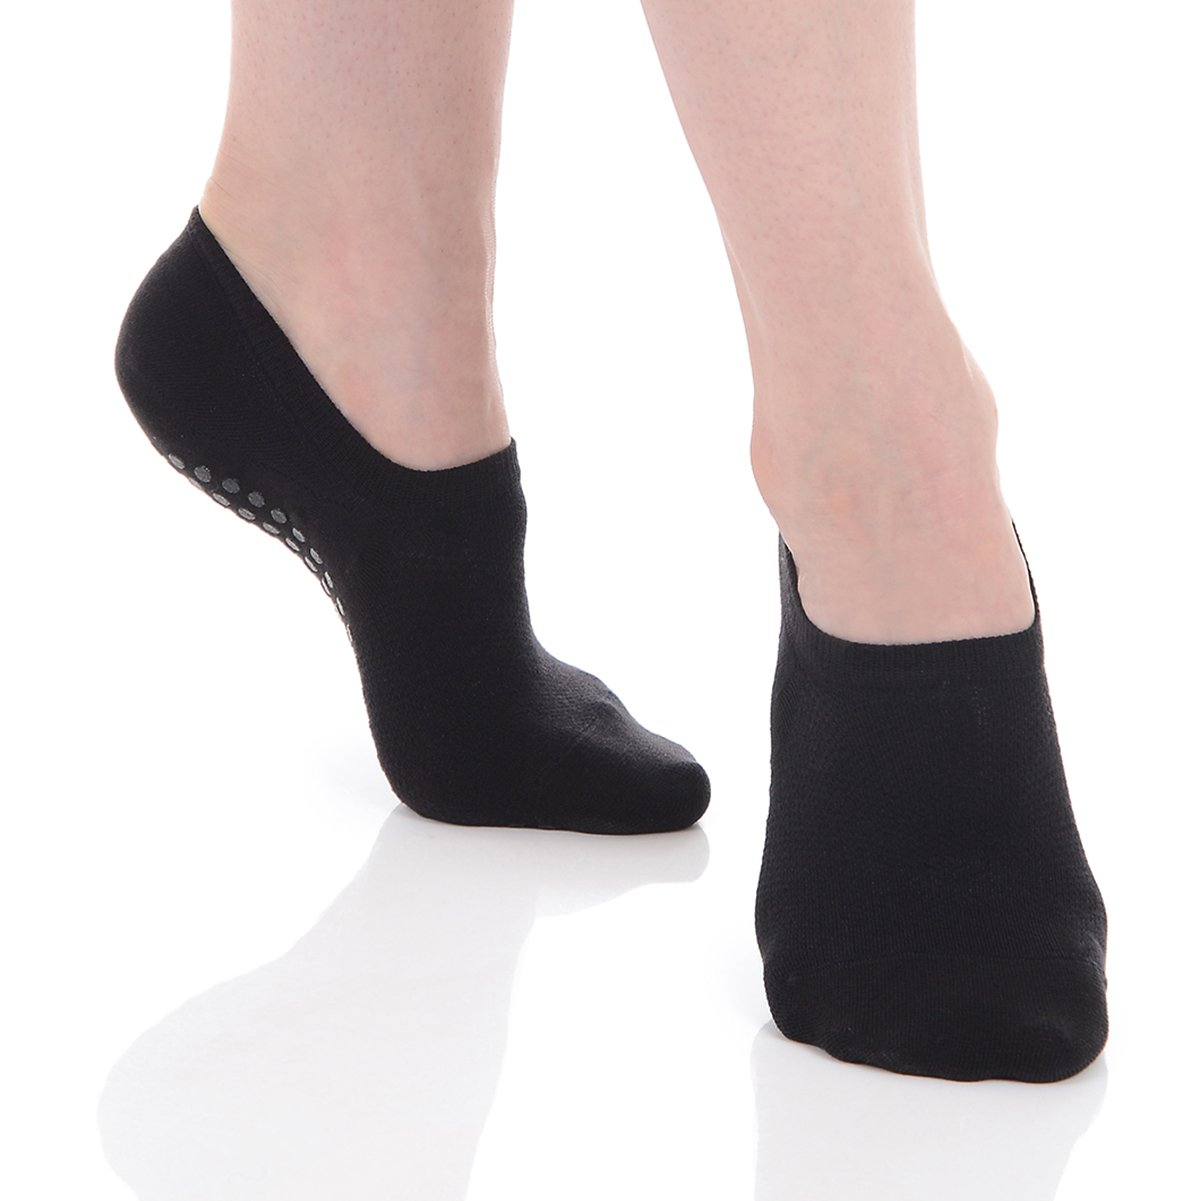 Great Soles Low Cut Grip Socks for Women and Men - Non Slip Yoga Socks for Pilates, Barre, Ballet